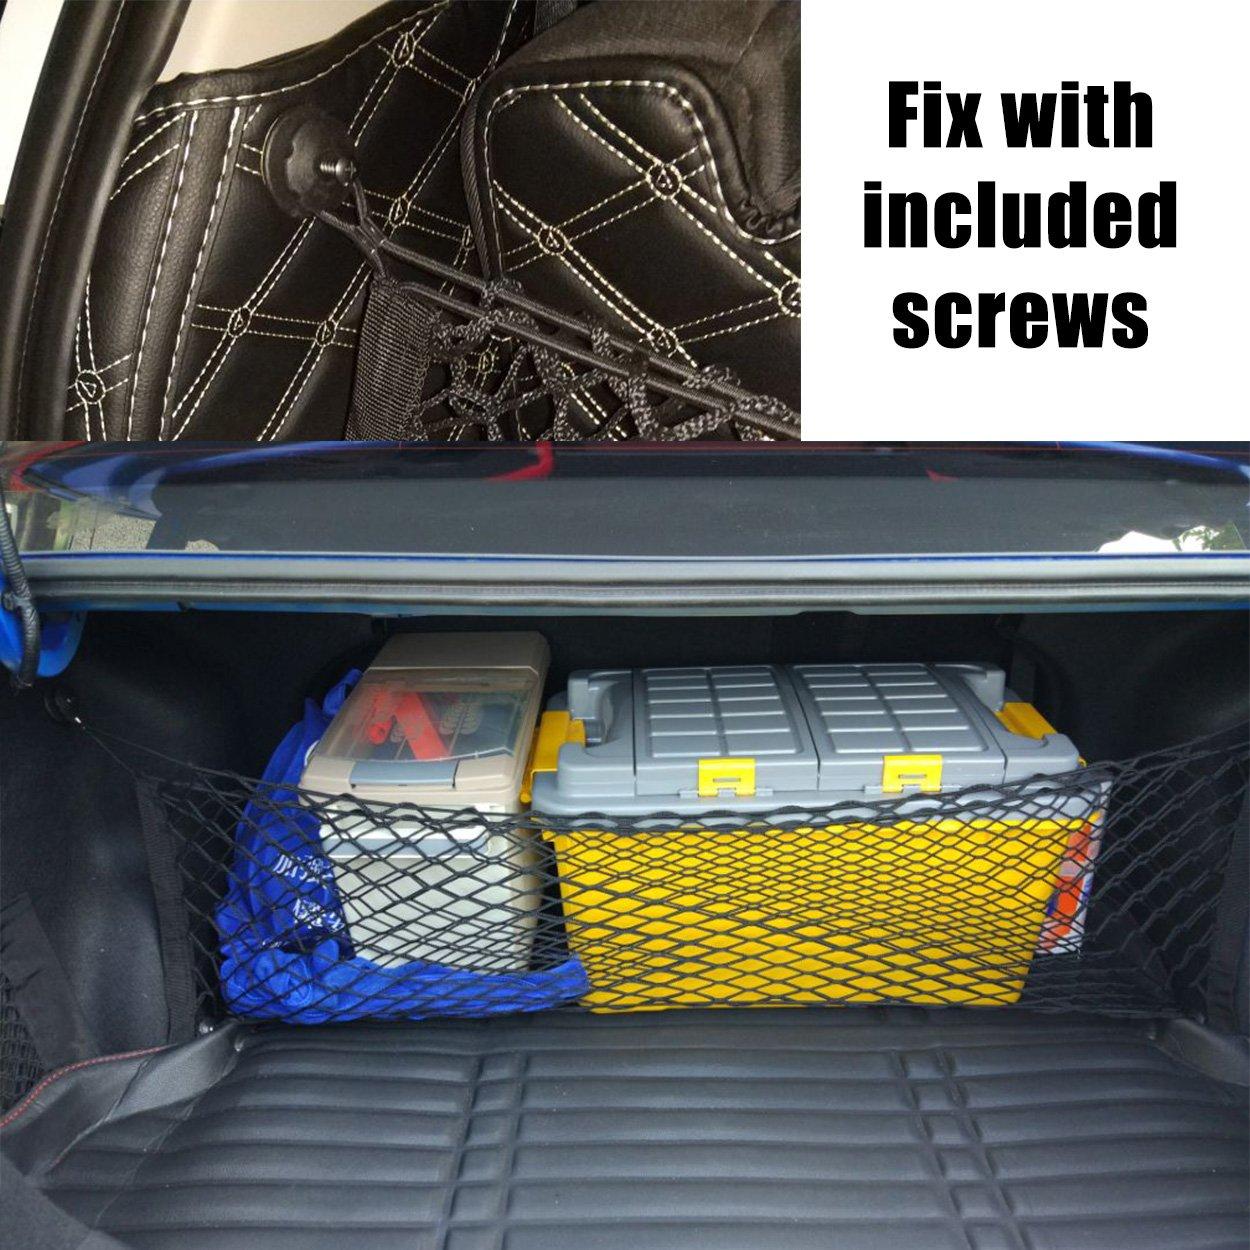 Naviurway 43.3 x 23.6 Black Universal Mesh Net Cargo Vehicle Trunk Storage Organizer for Trailer SUV Motorcycle ATV